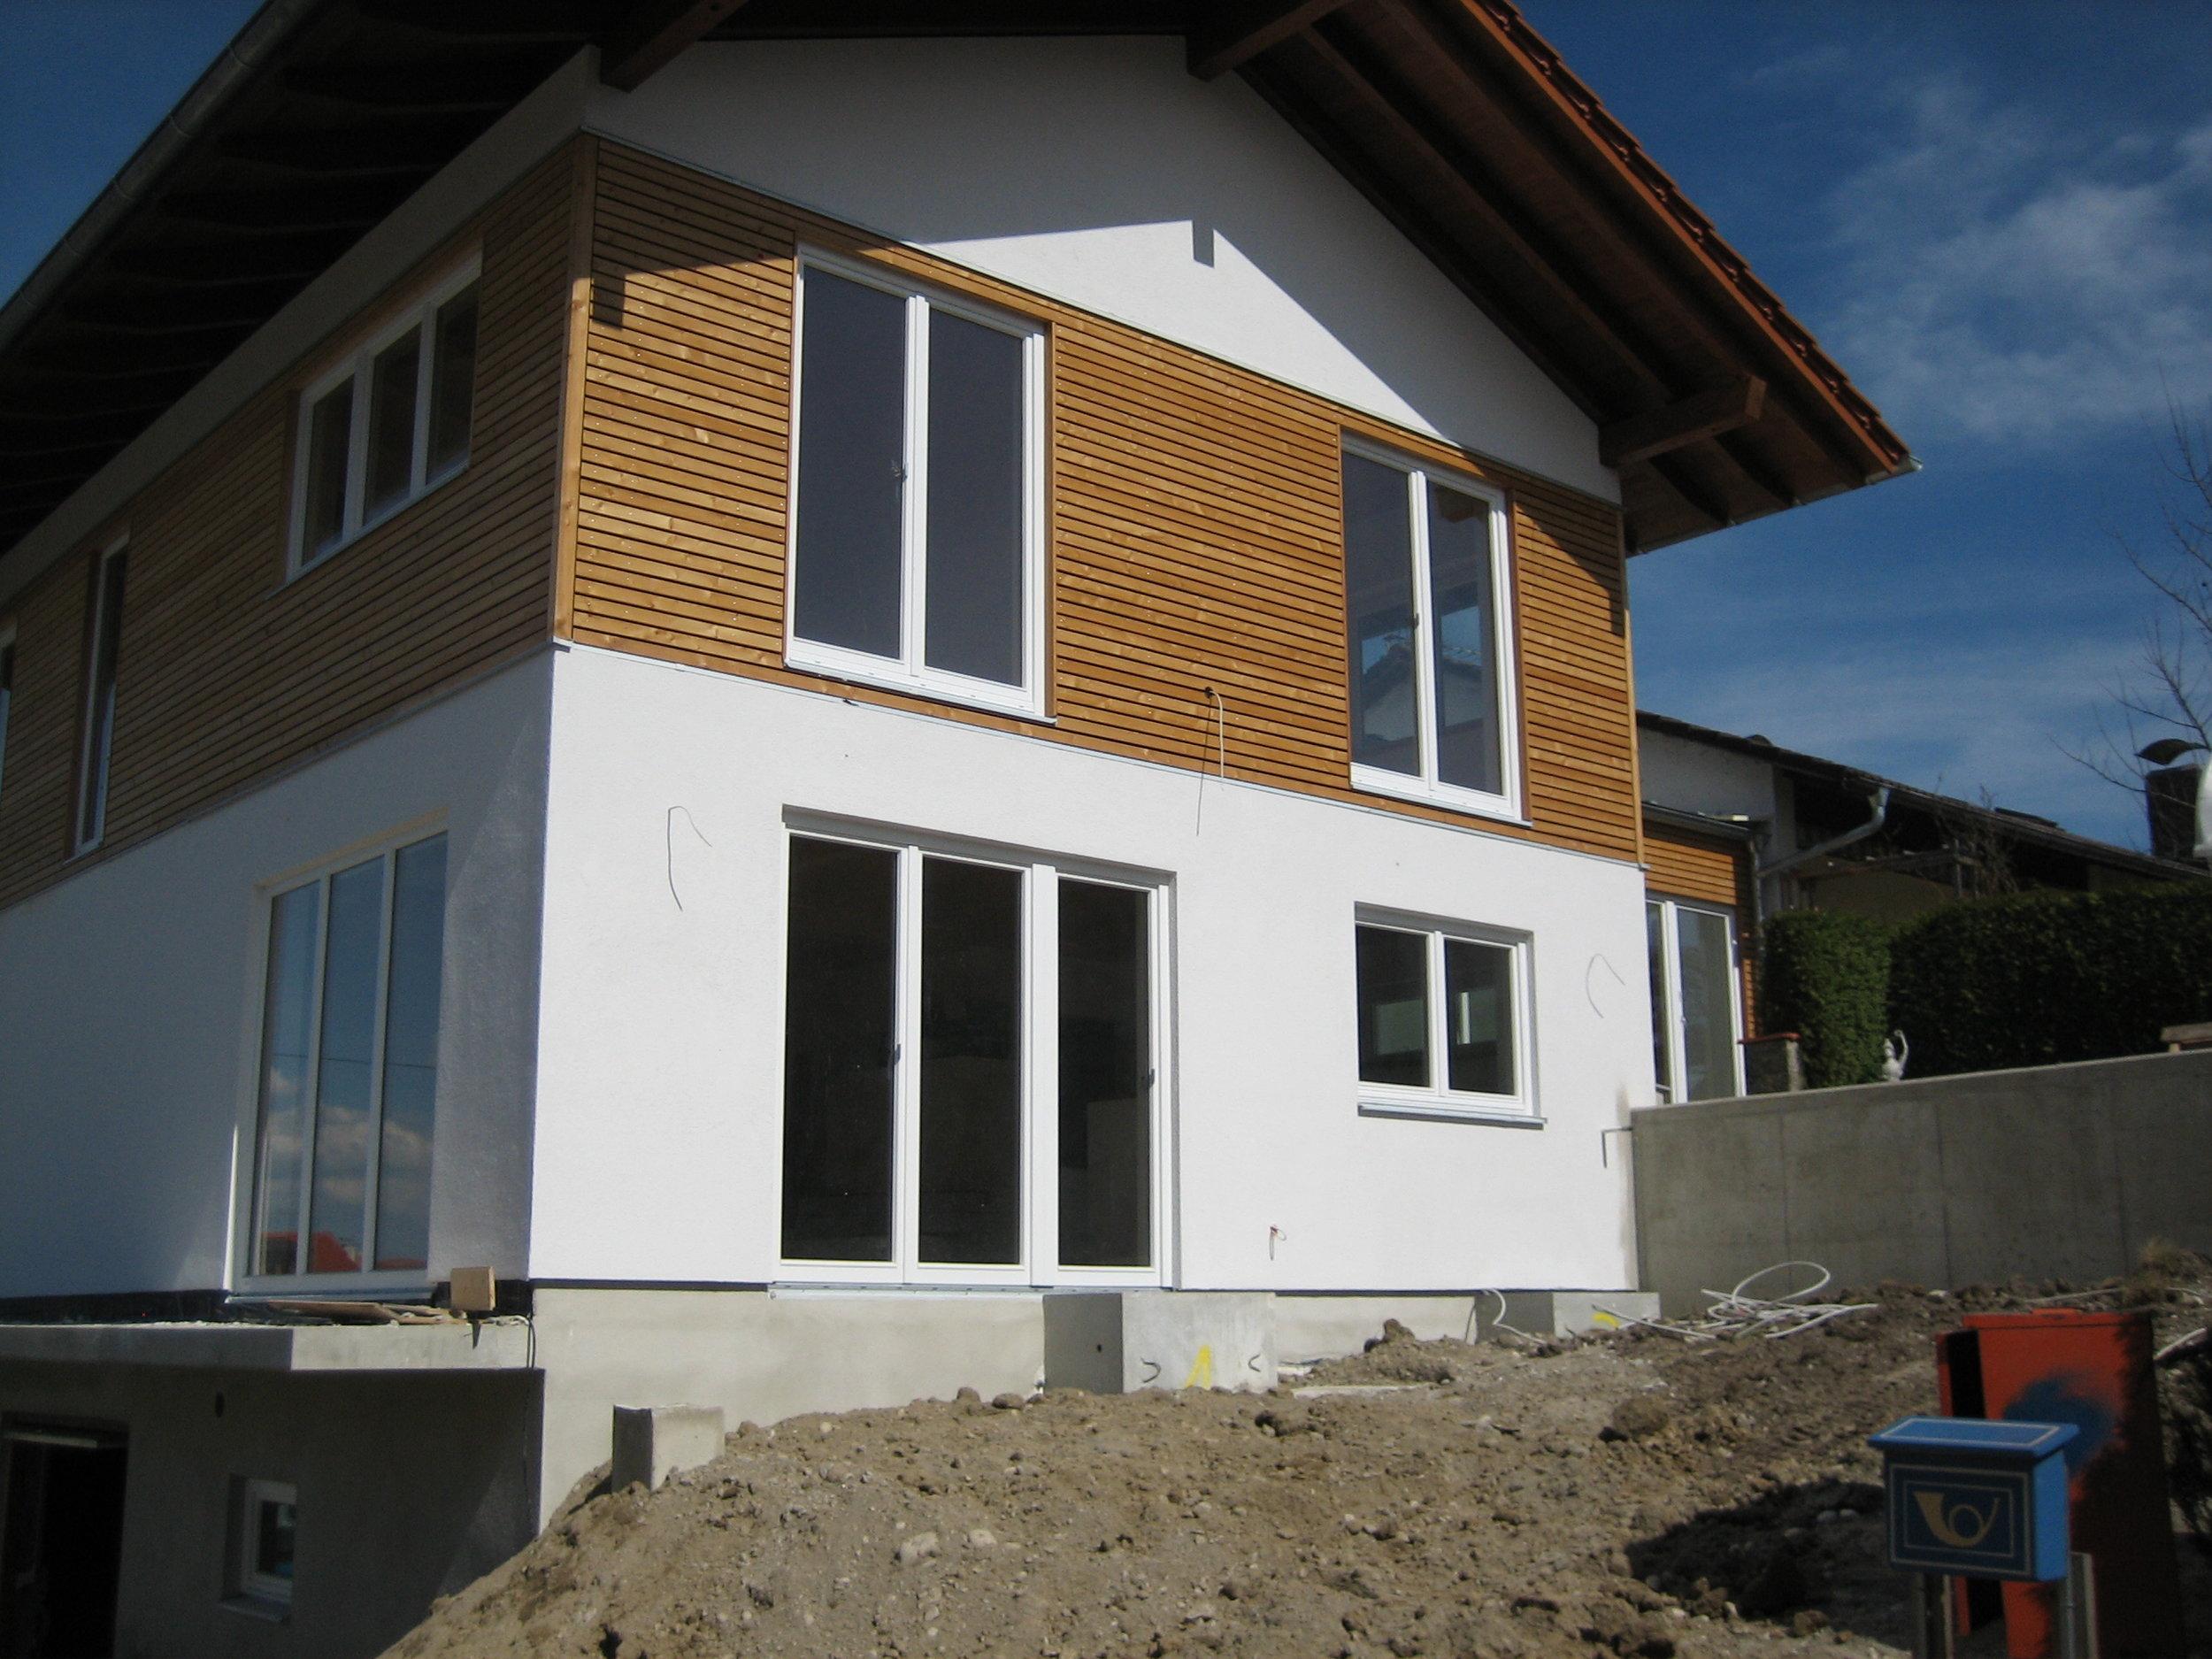 Einfamilienhaus, BJ 2009